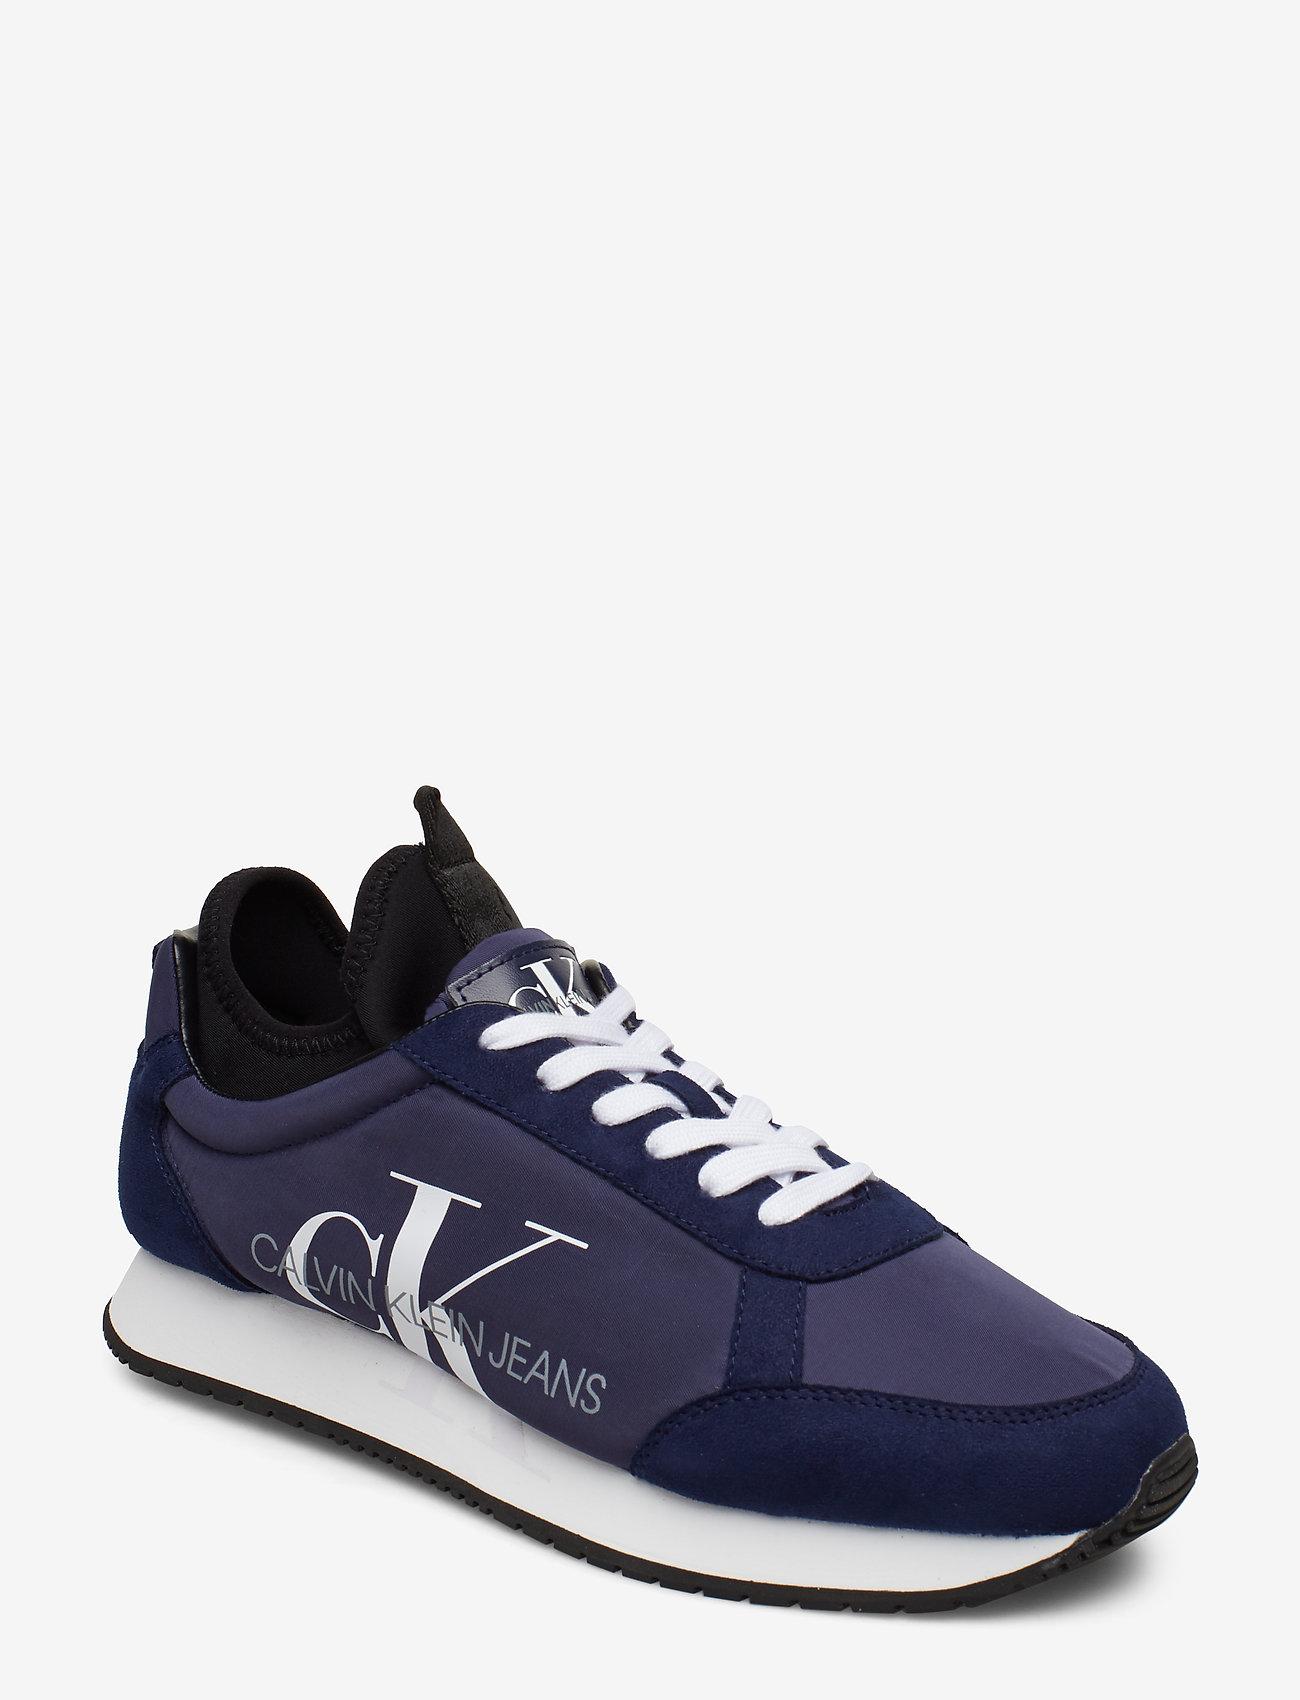 Calvin Klein - JEMMY - laag sneakers - medieval blue - 0